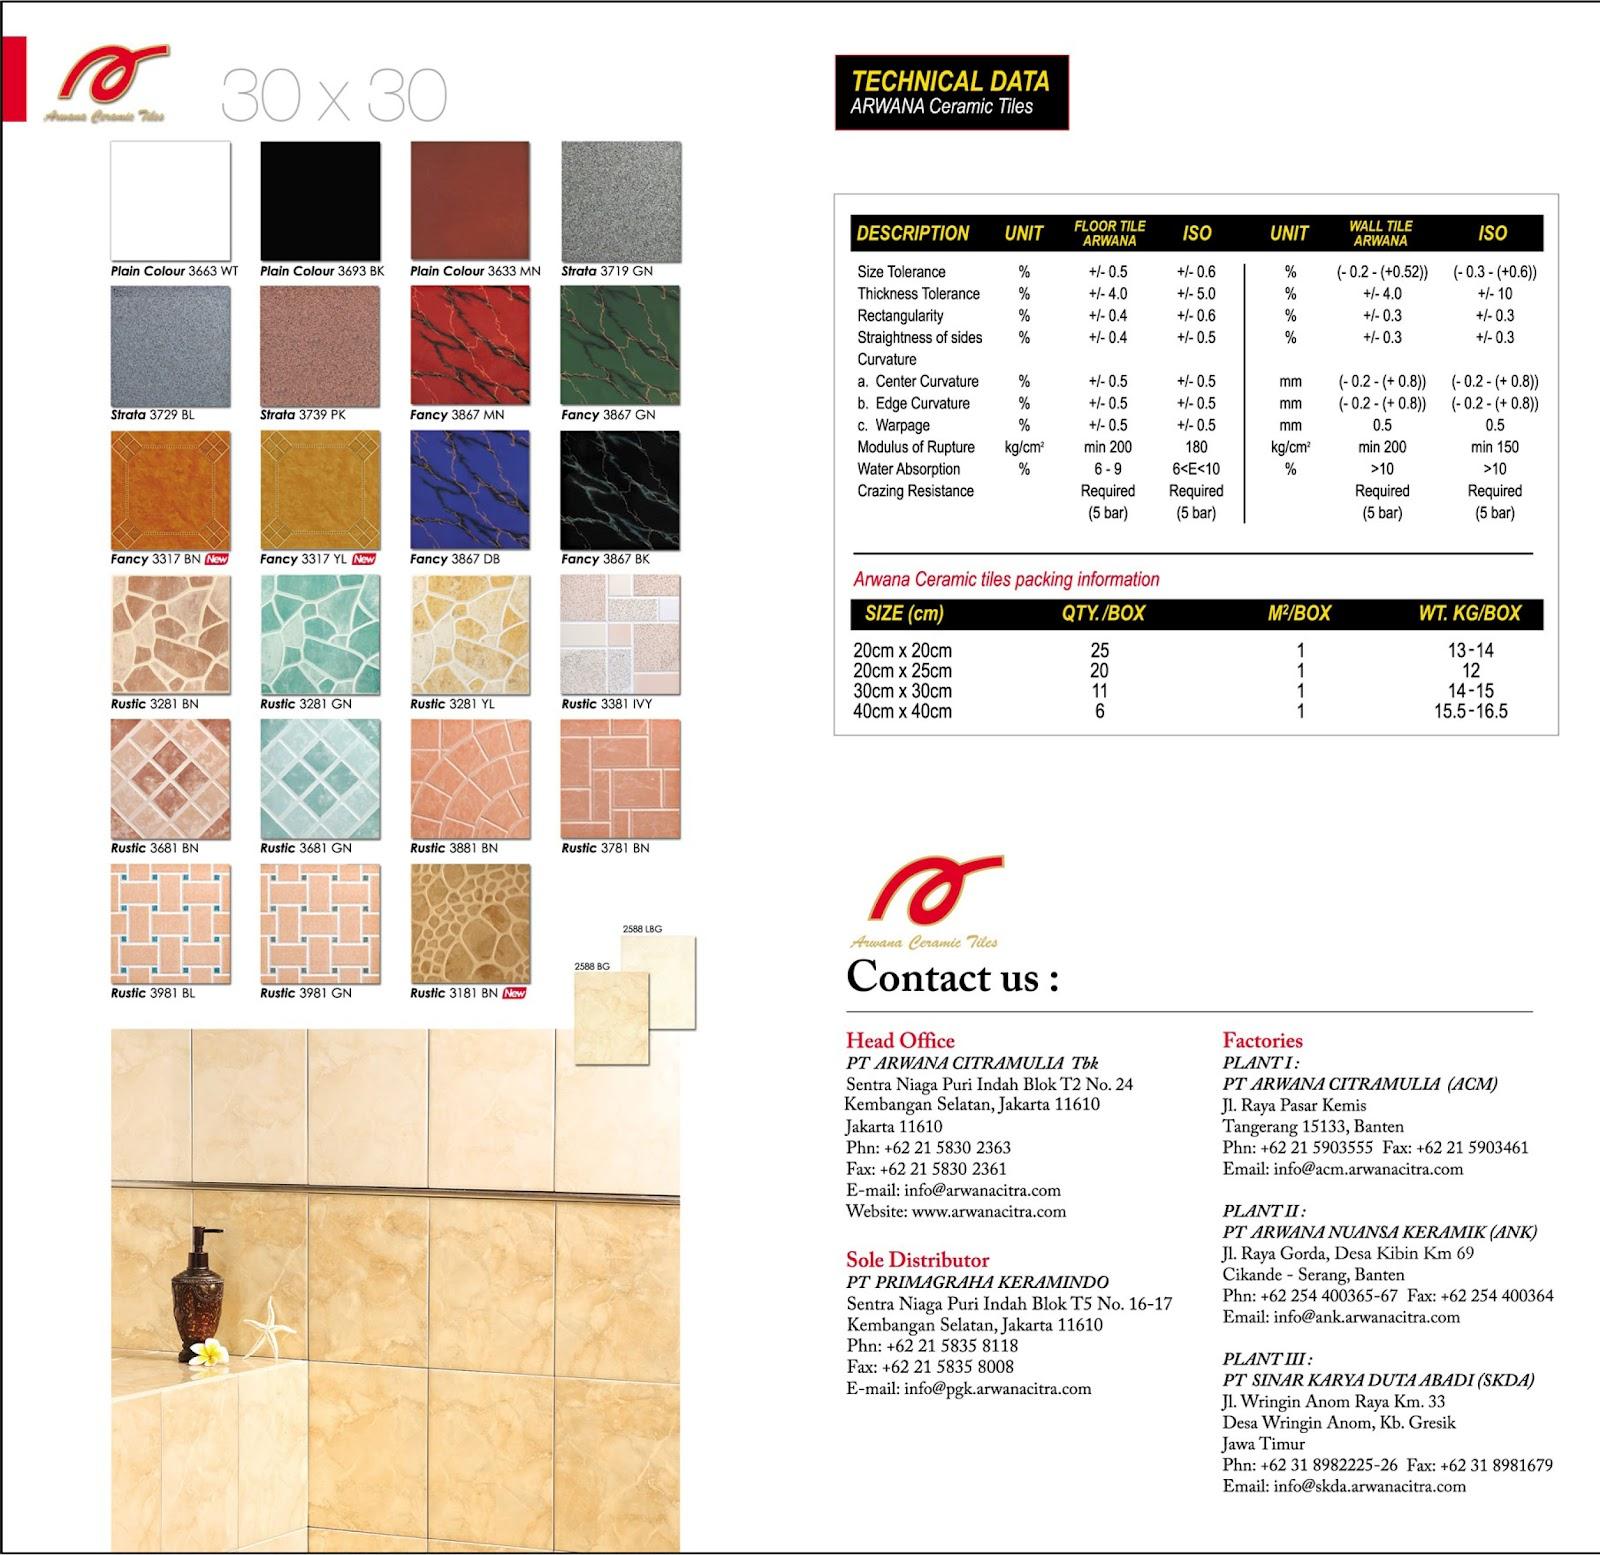 Harga Bahan Bangunan Cat Tembok Wall Paint Pictures | Apps Directories